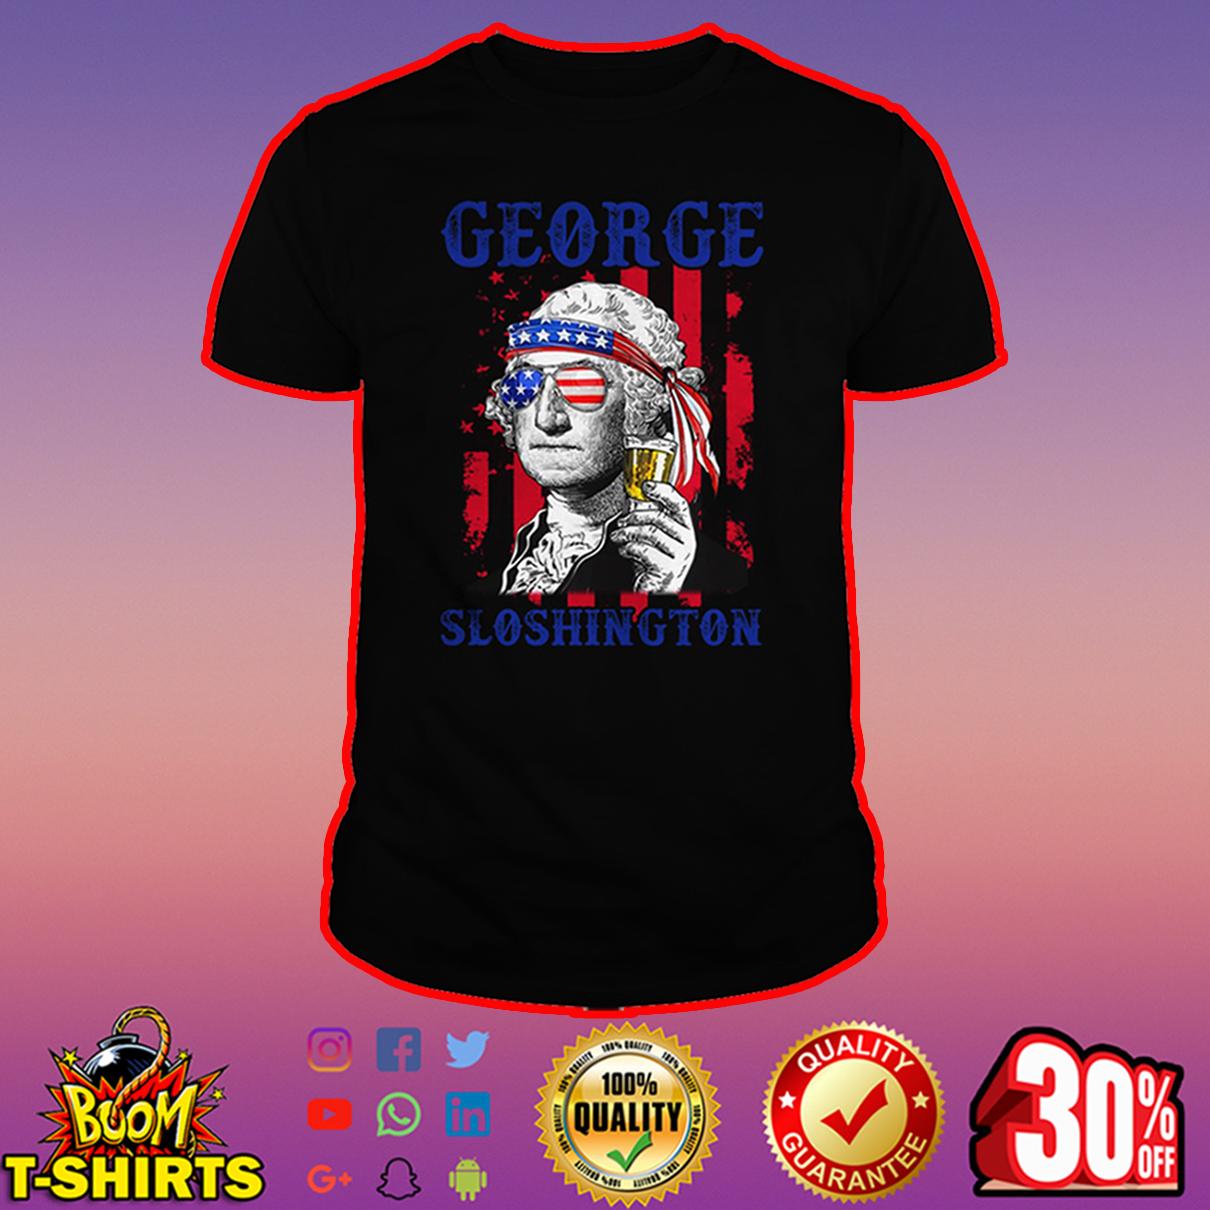 George Sloshington 4th of July shirt